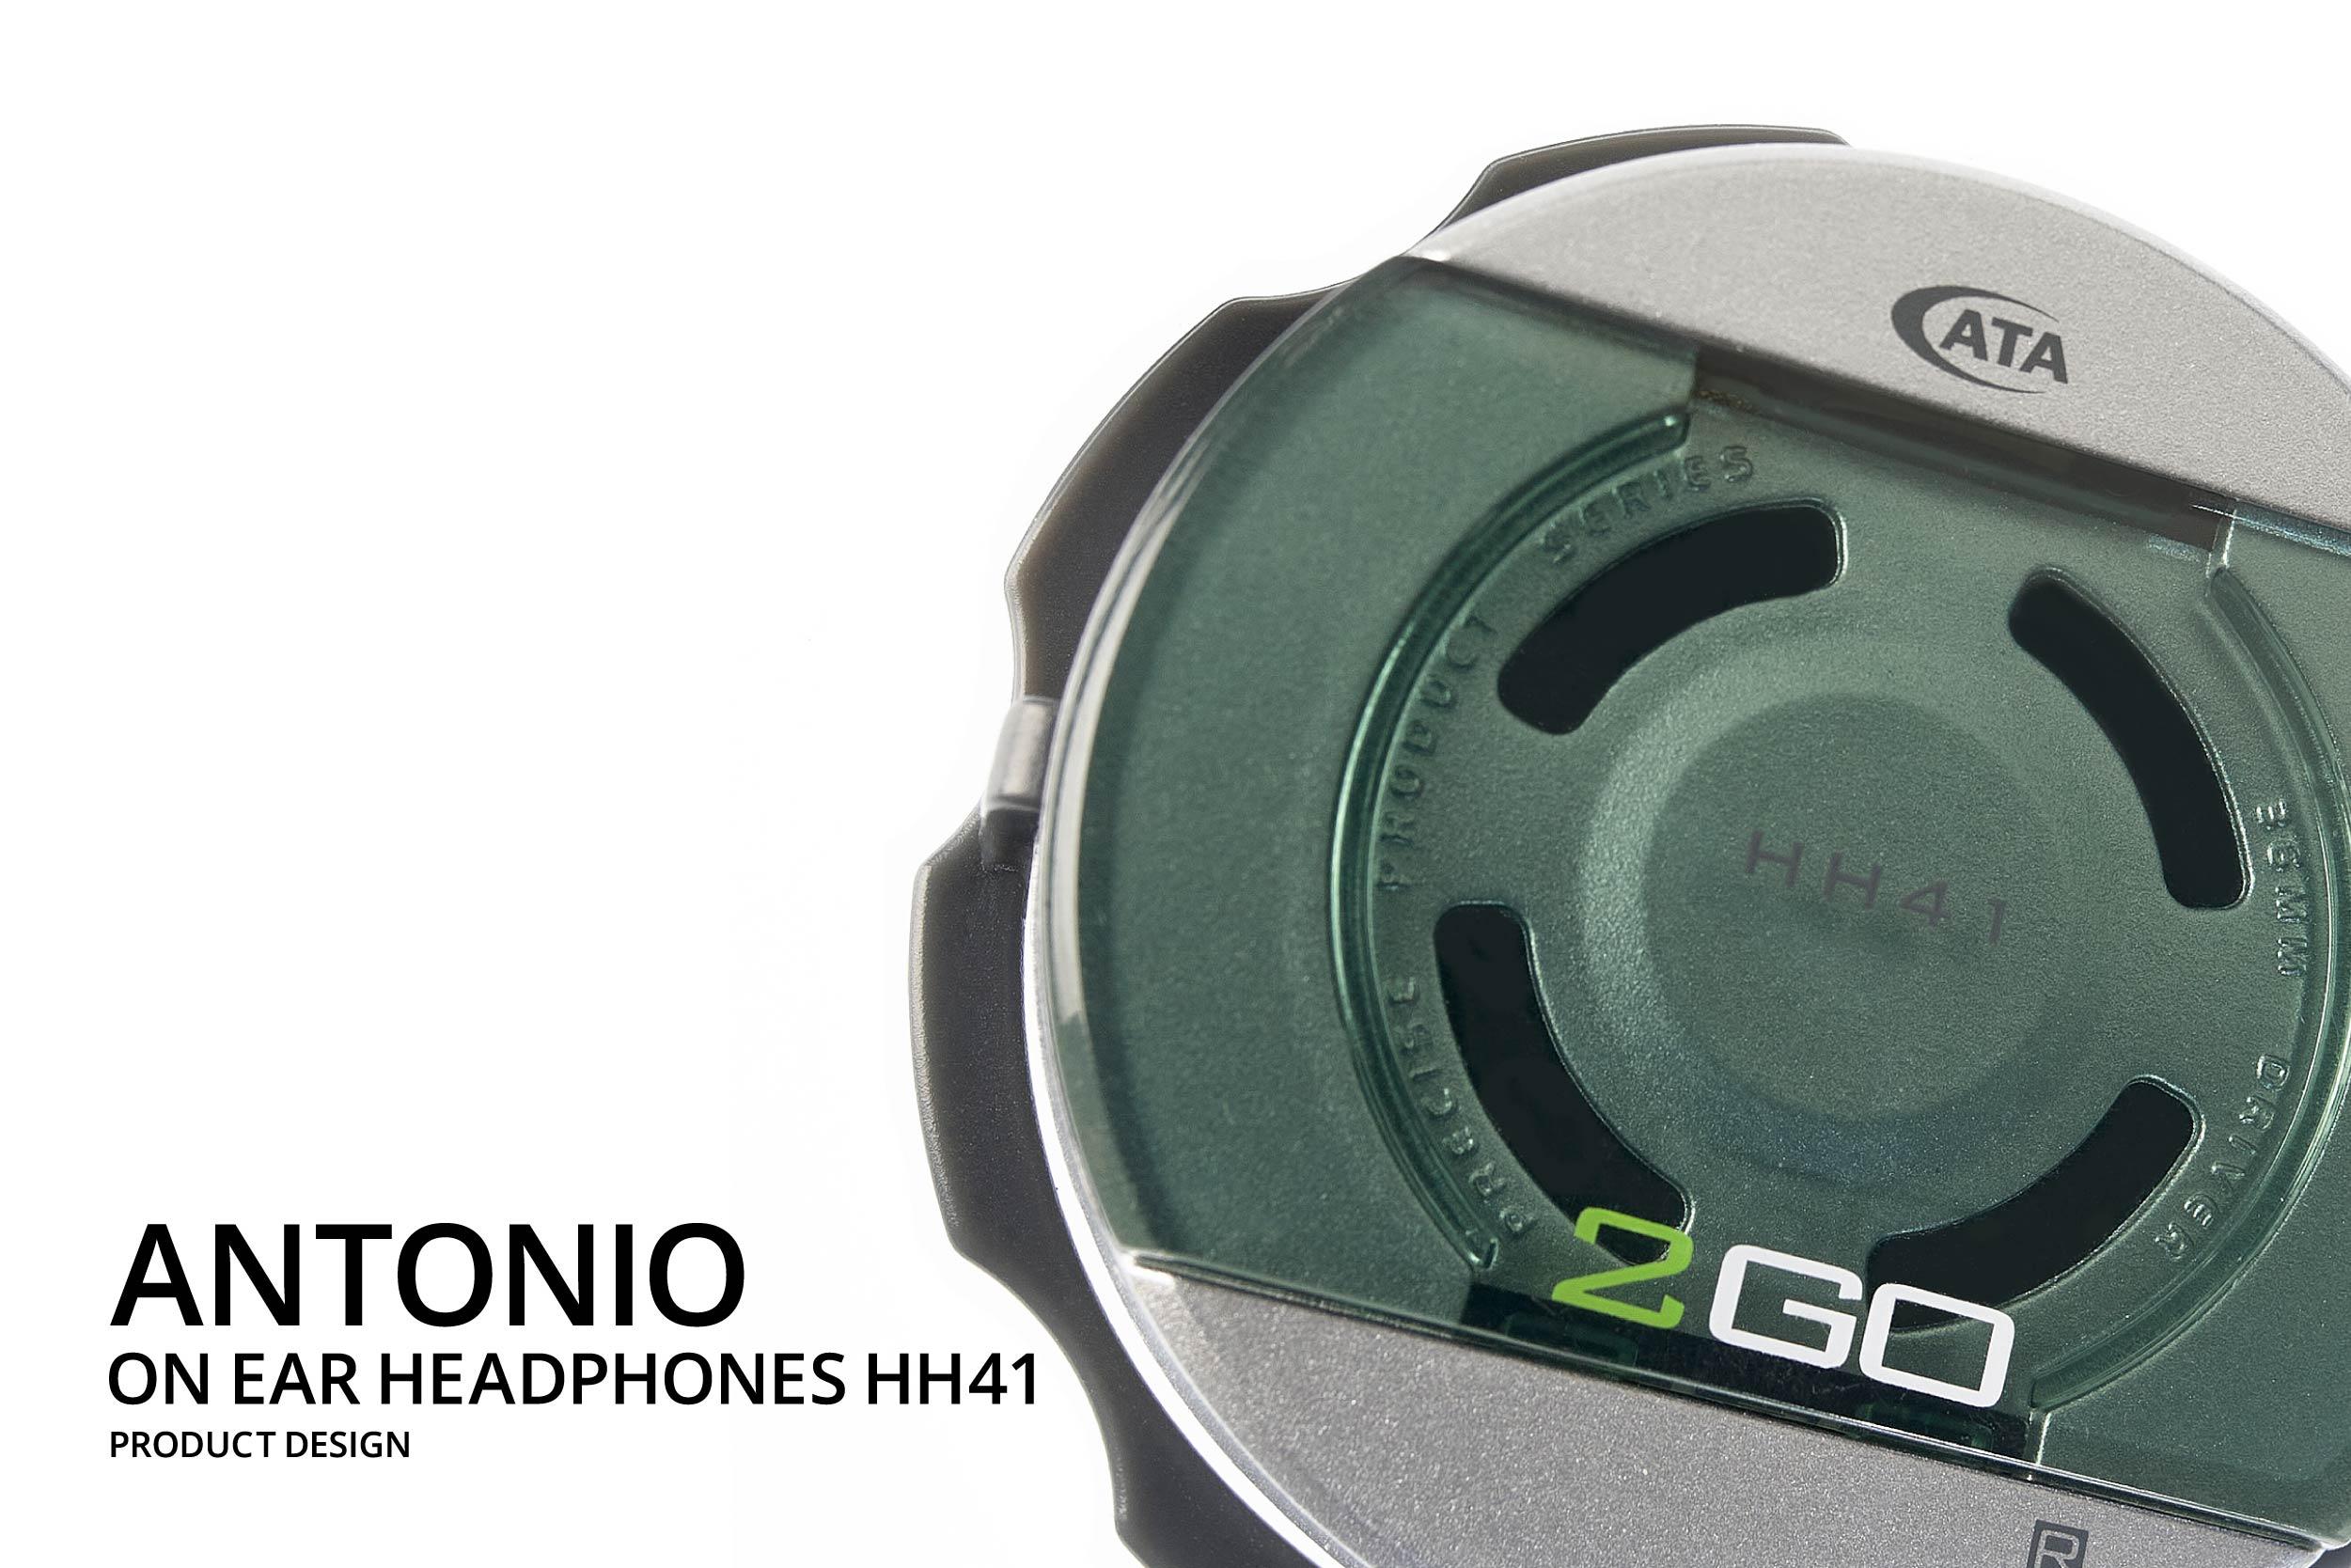 ANTONIO-HH41-1